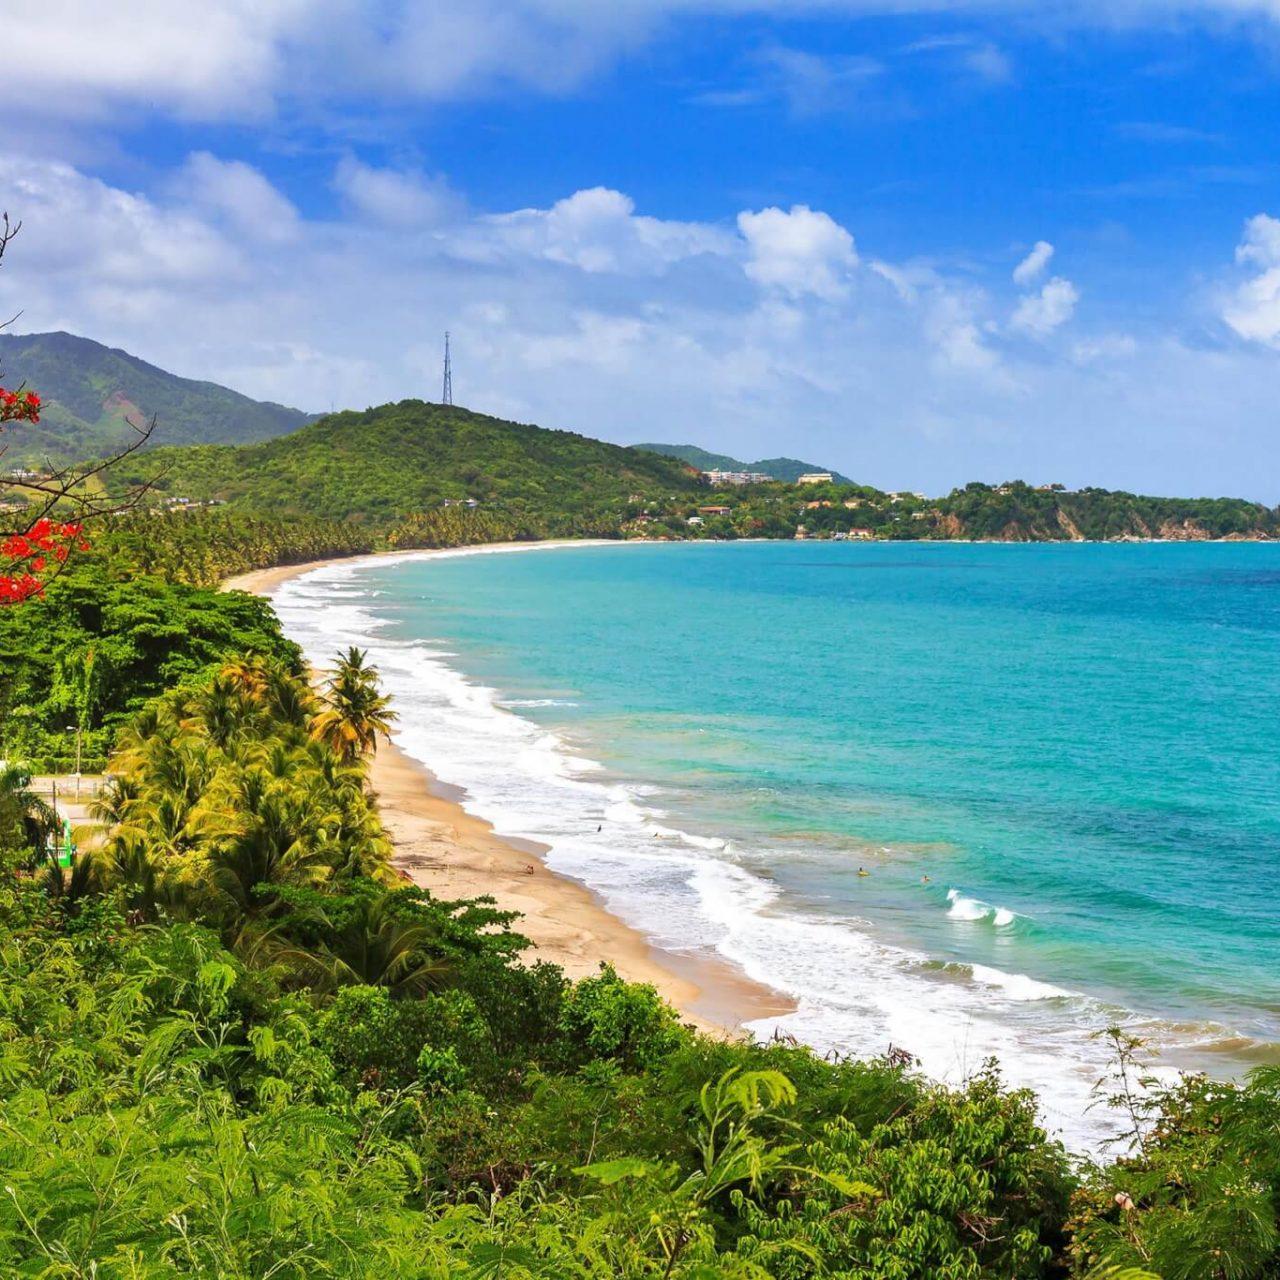 https://travelicious.bold-themes.com/main-demo/wp-content/uploads/sites/2/2018/09/destination-puerto-rico-01-1280x1280.jpg